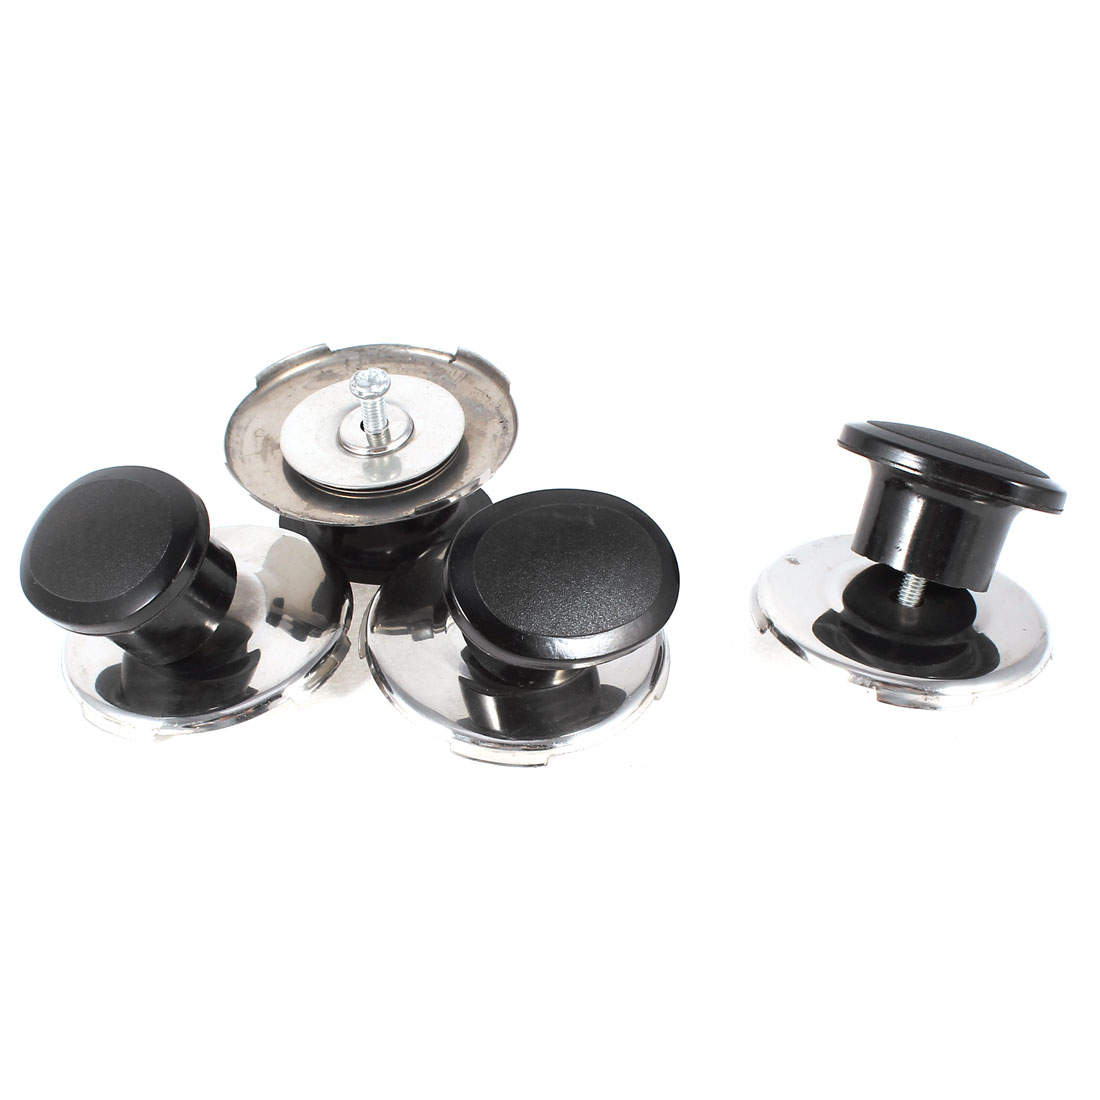 Black Silver Tone Oval Shape Plastic Grip Cookware Lid Cover Knob 4 Pcs